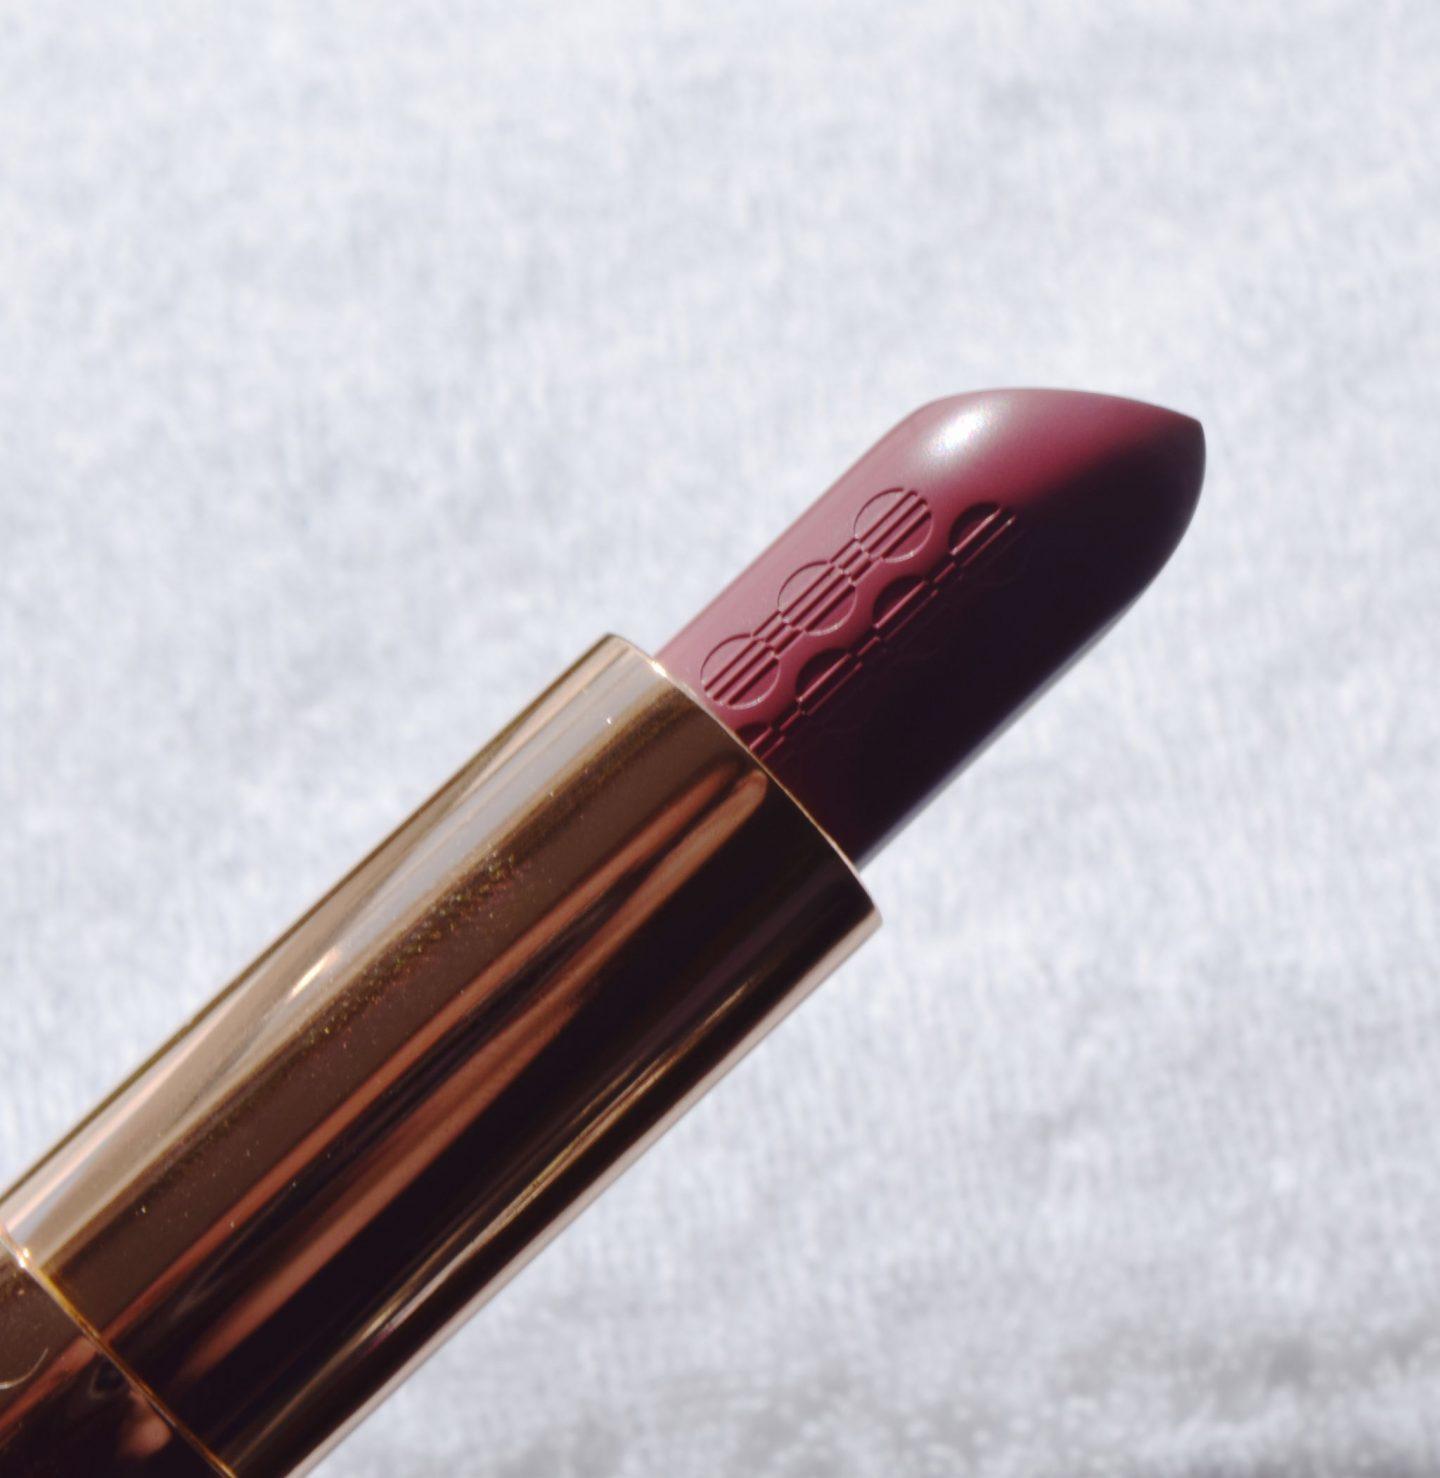 Kiko 01 Lavish Lipstick 2